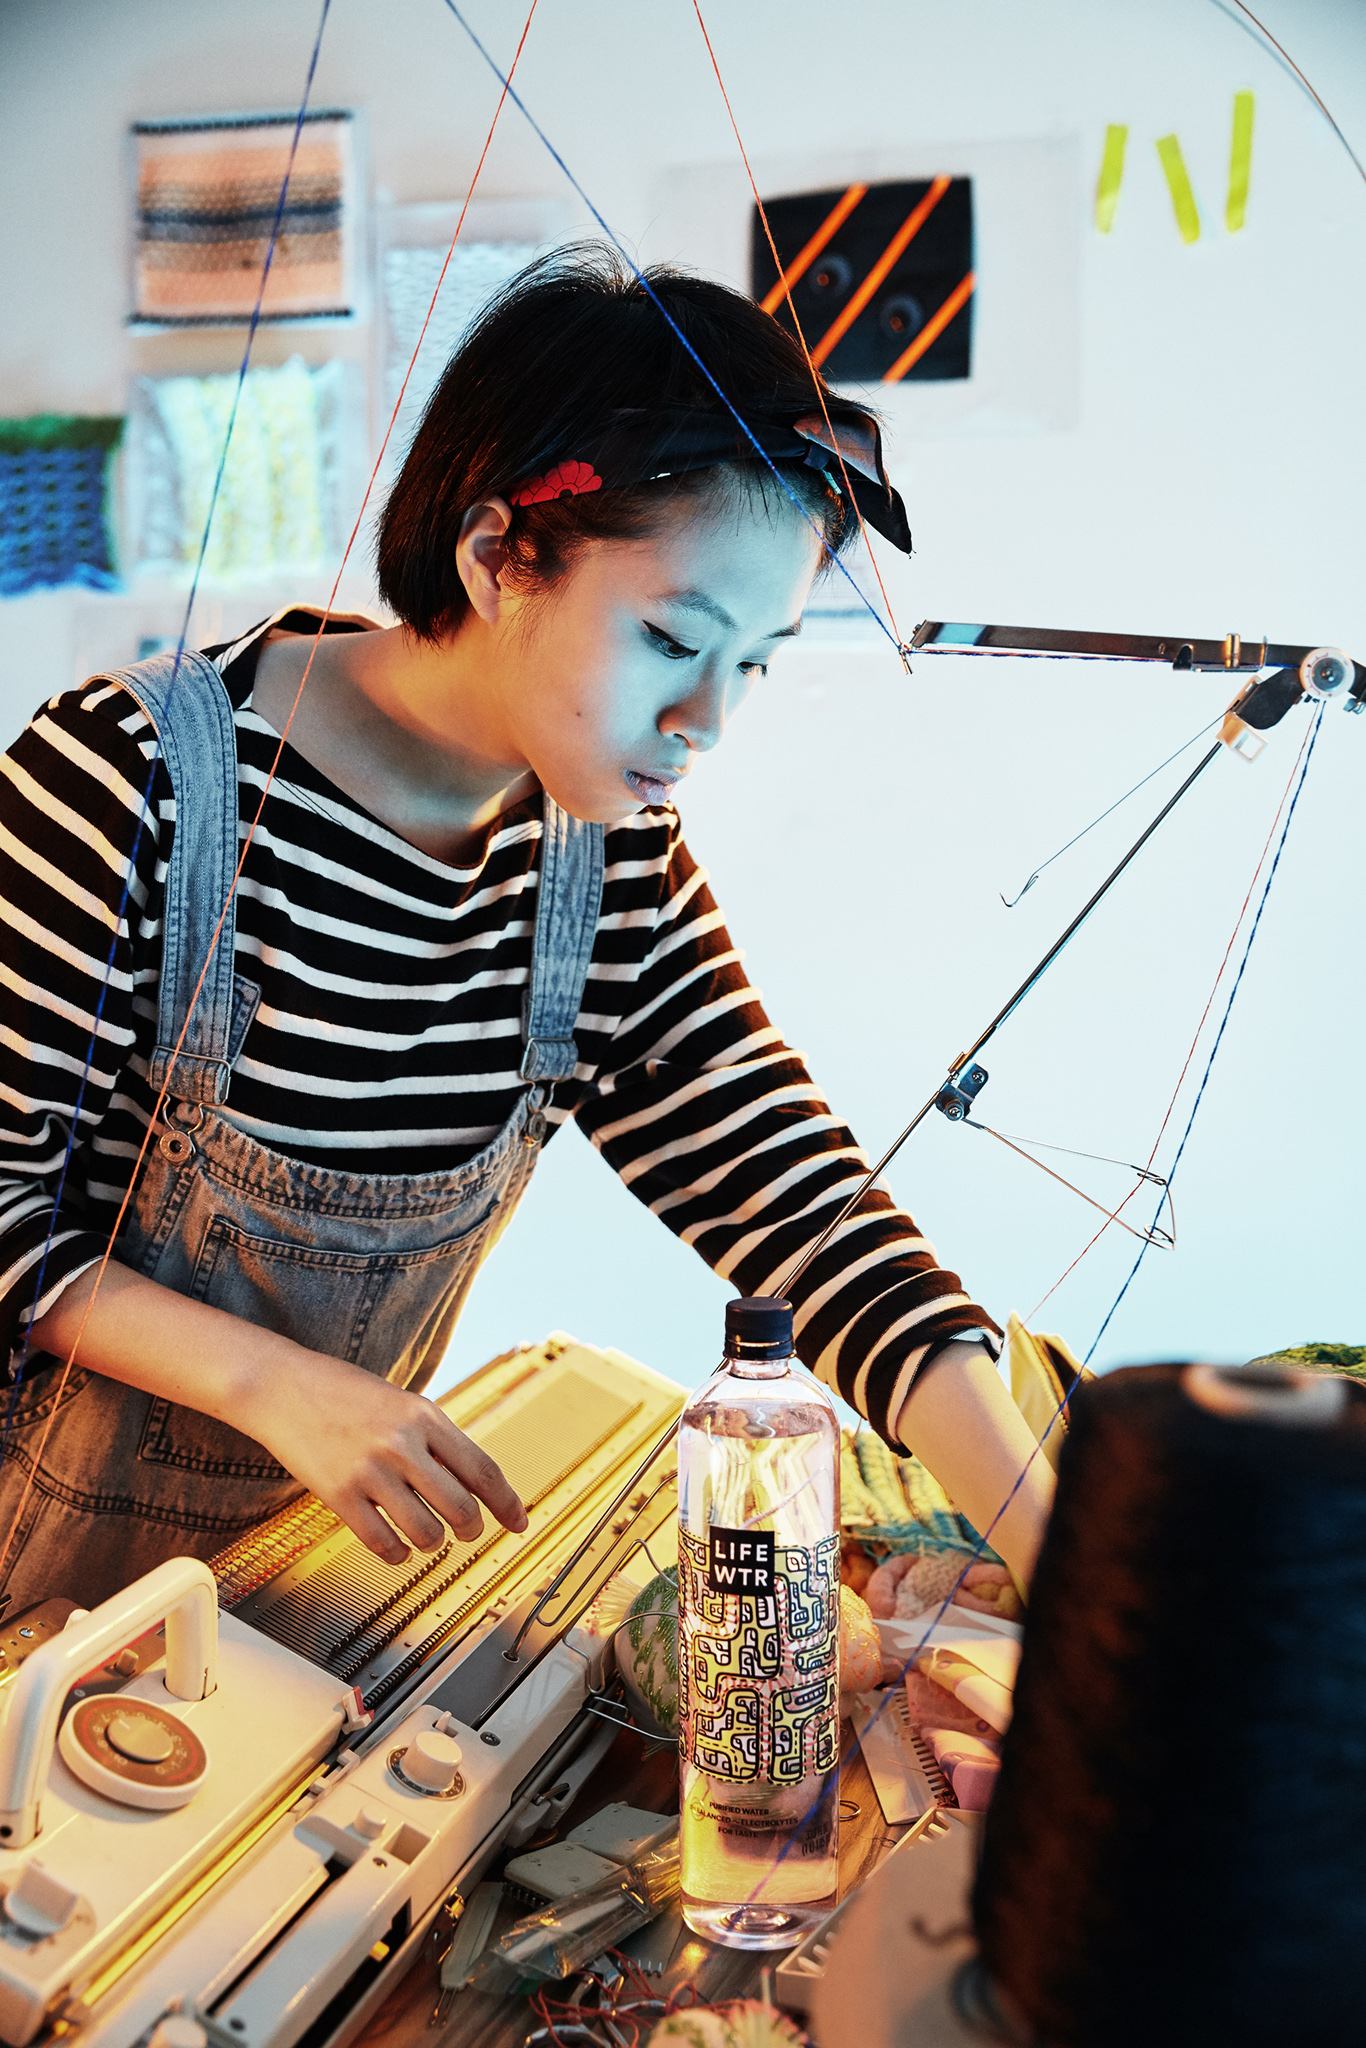 LIFEWTR Series 3 Artist Tiffany Huang